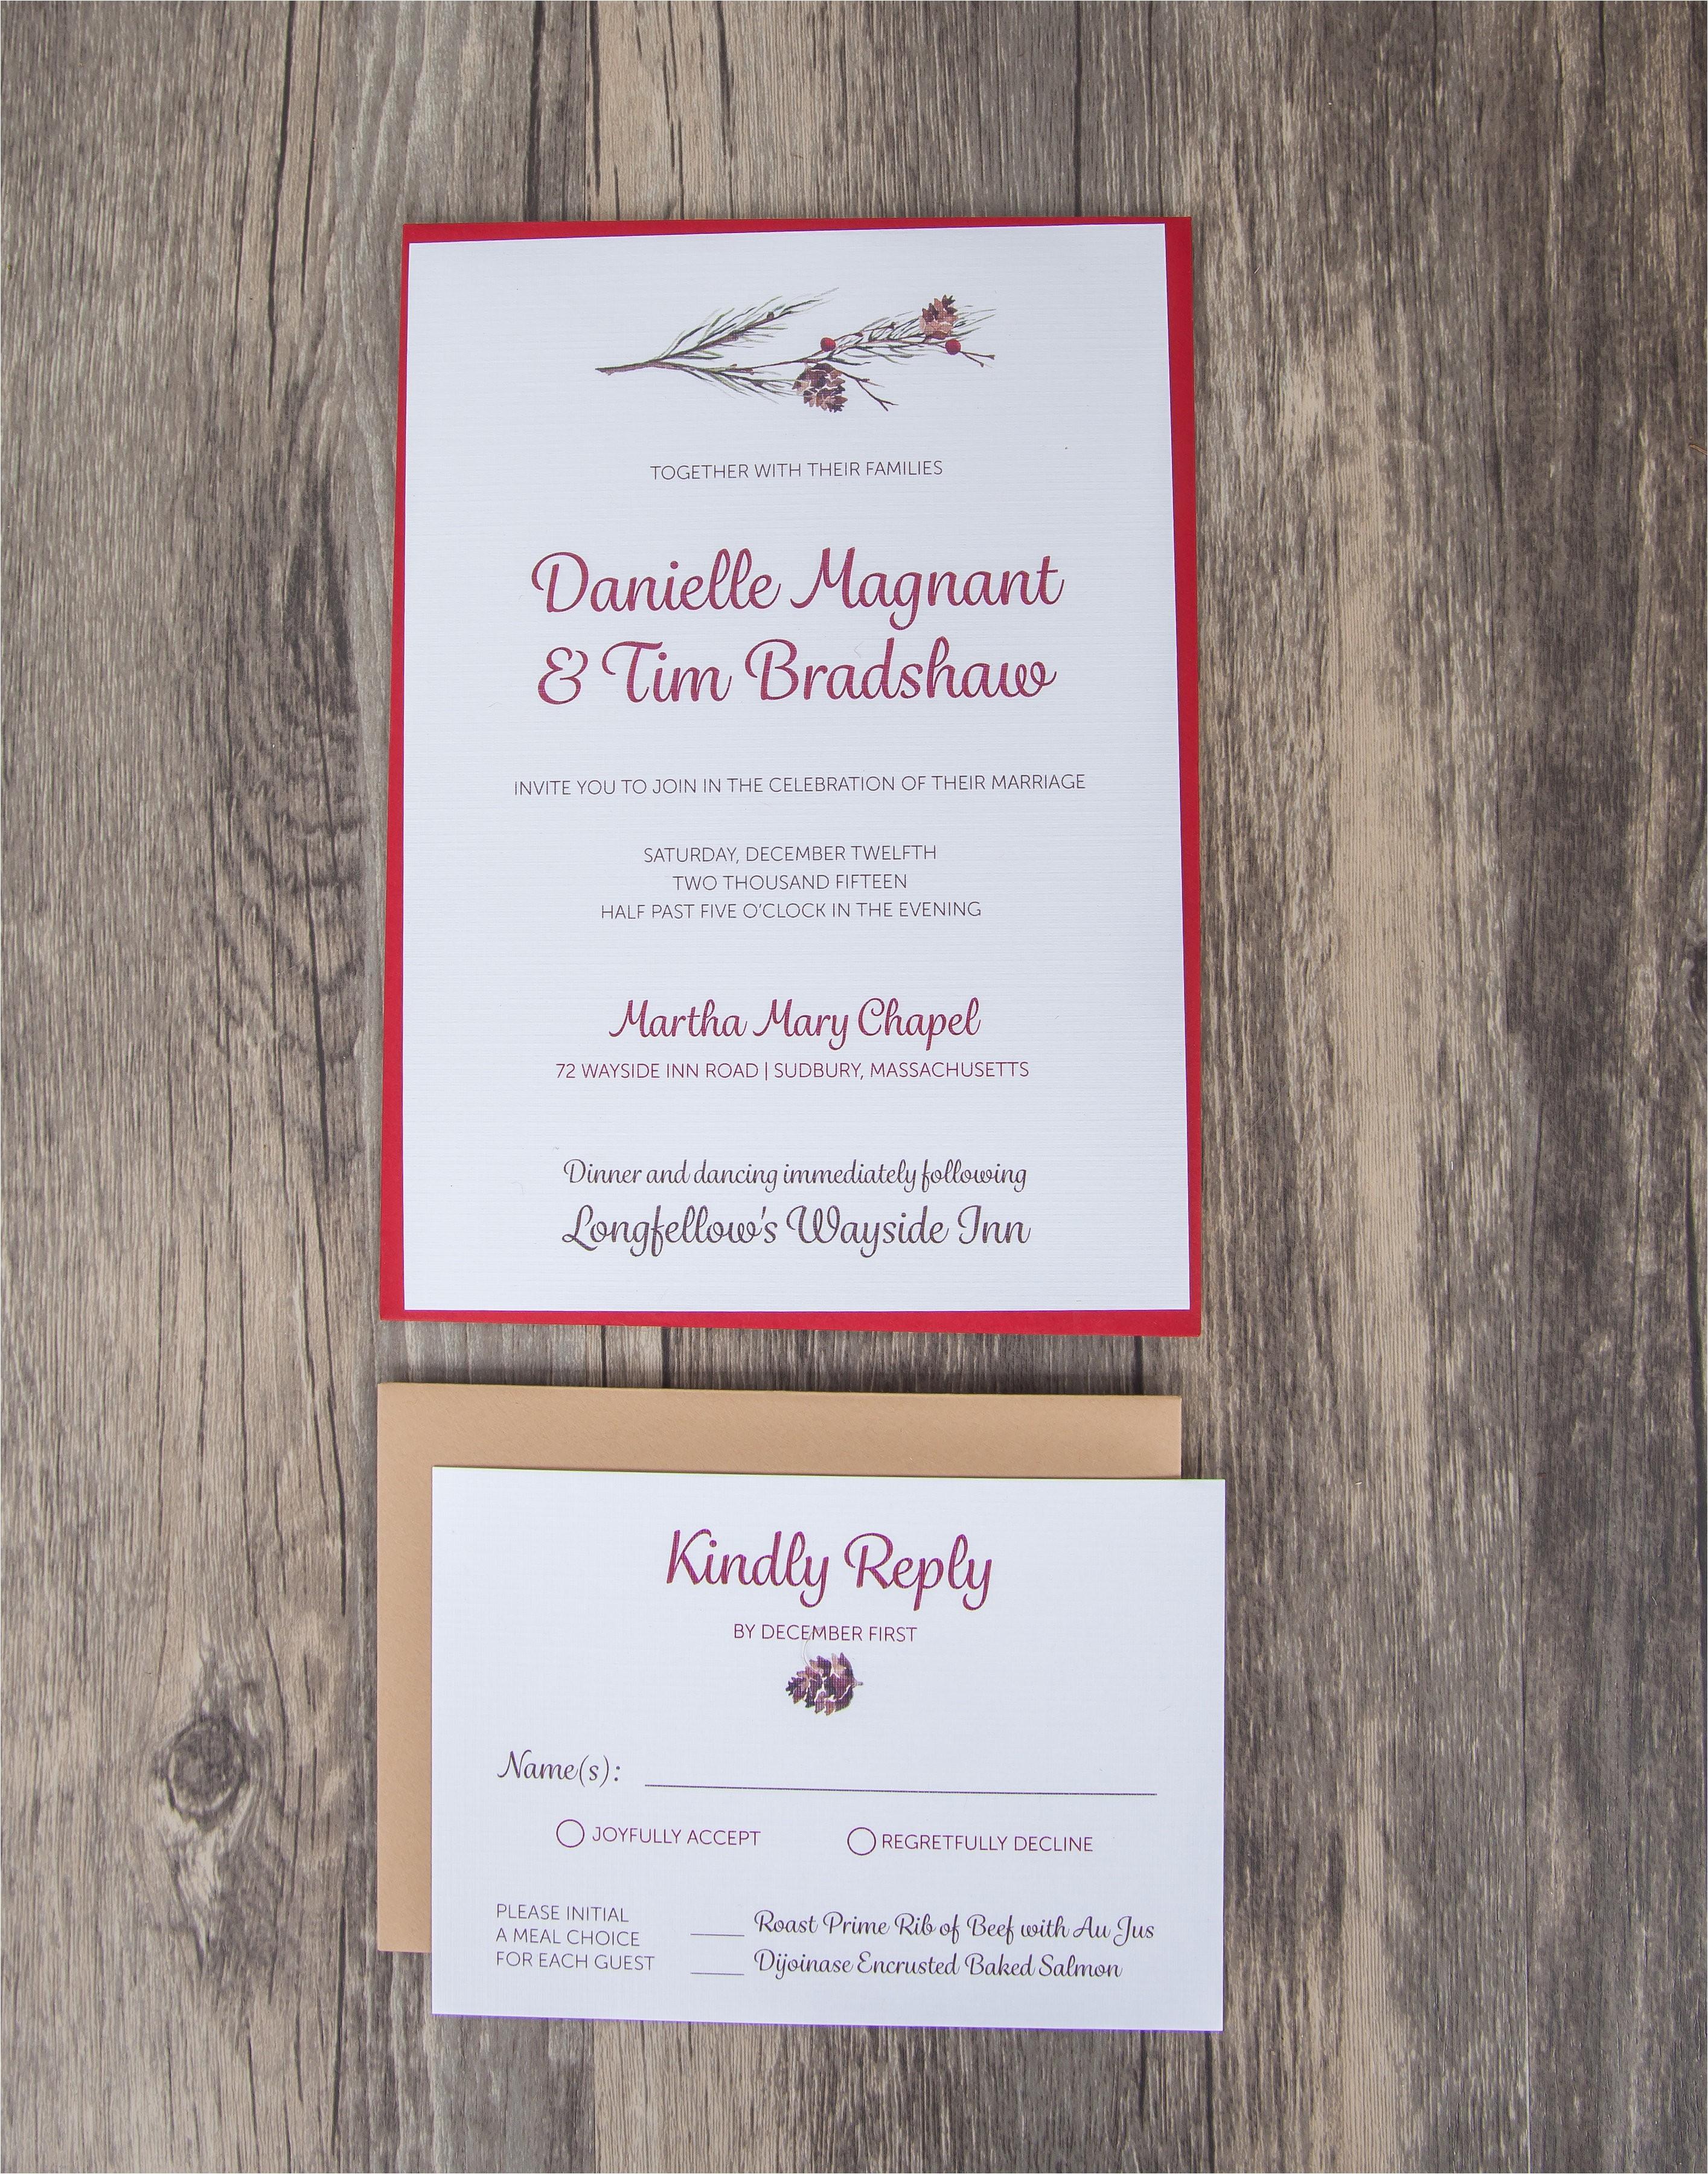 wedding invitation kits staples canada